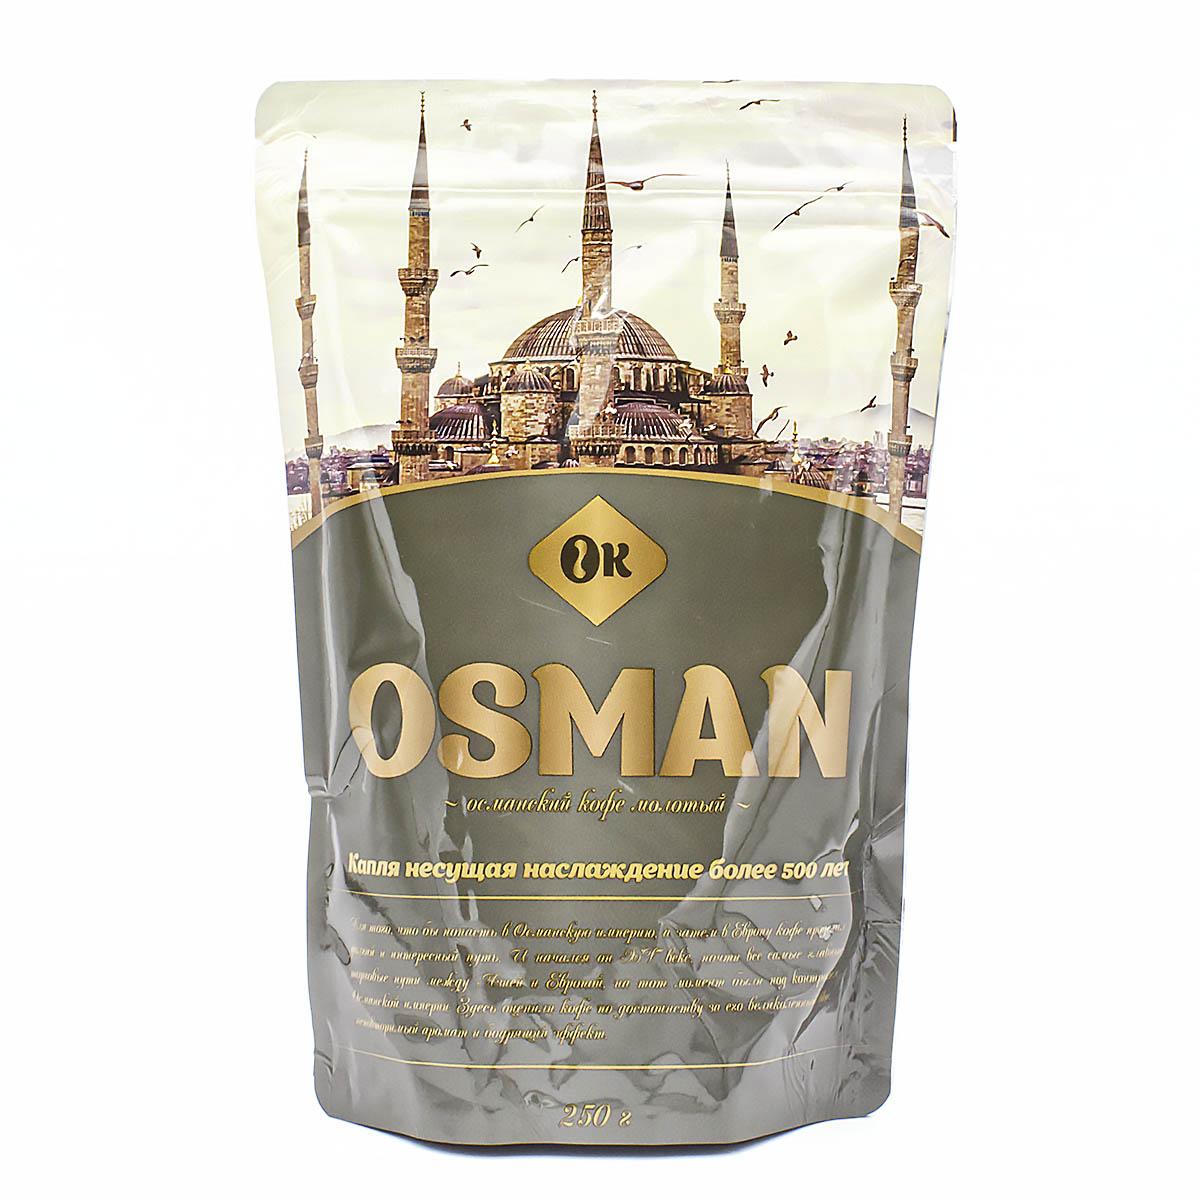 Турецкий молотый кофе Osman, 250 гр. цена и фото